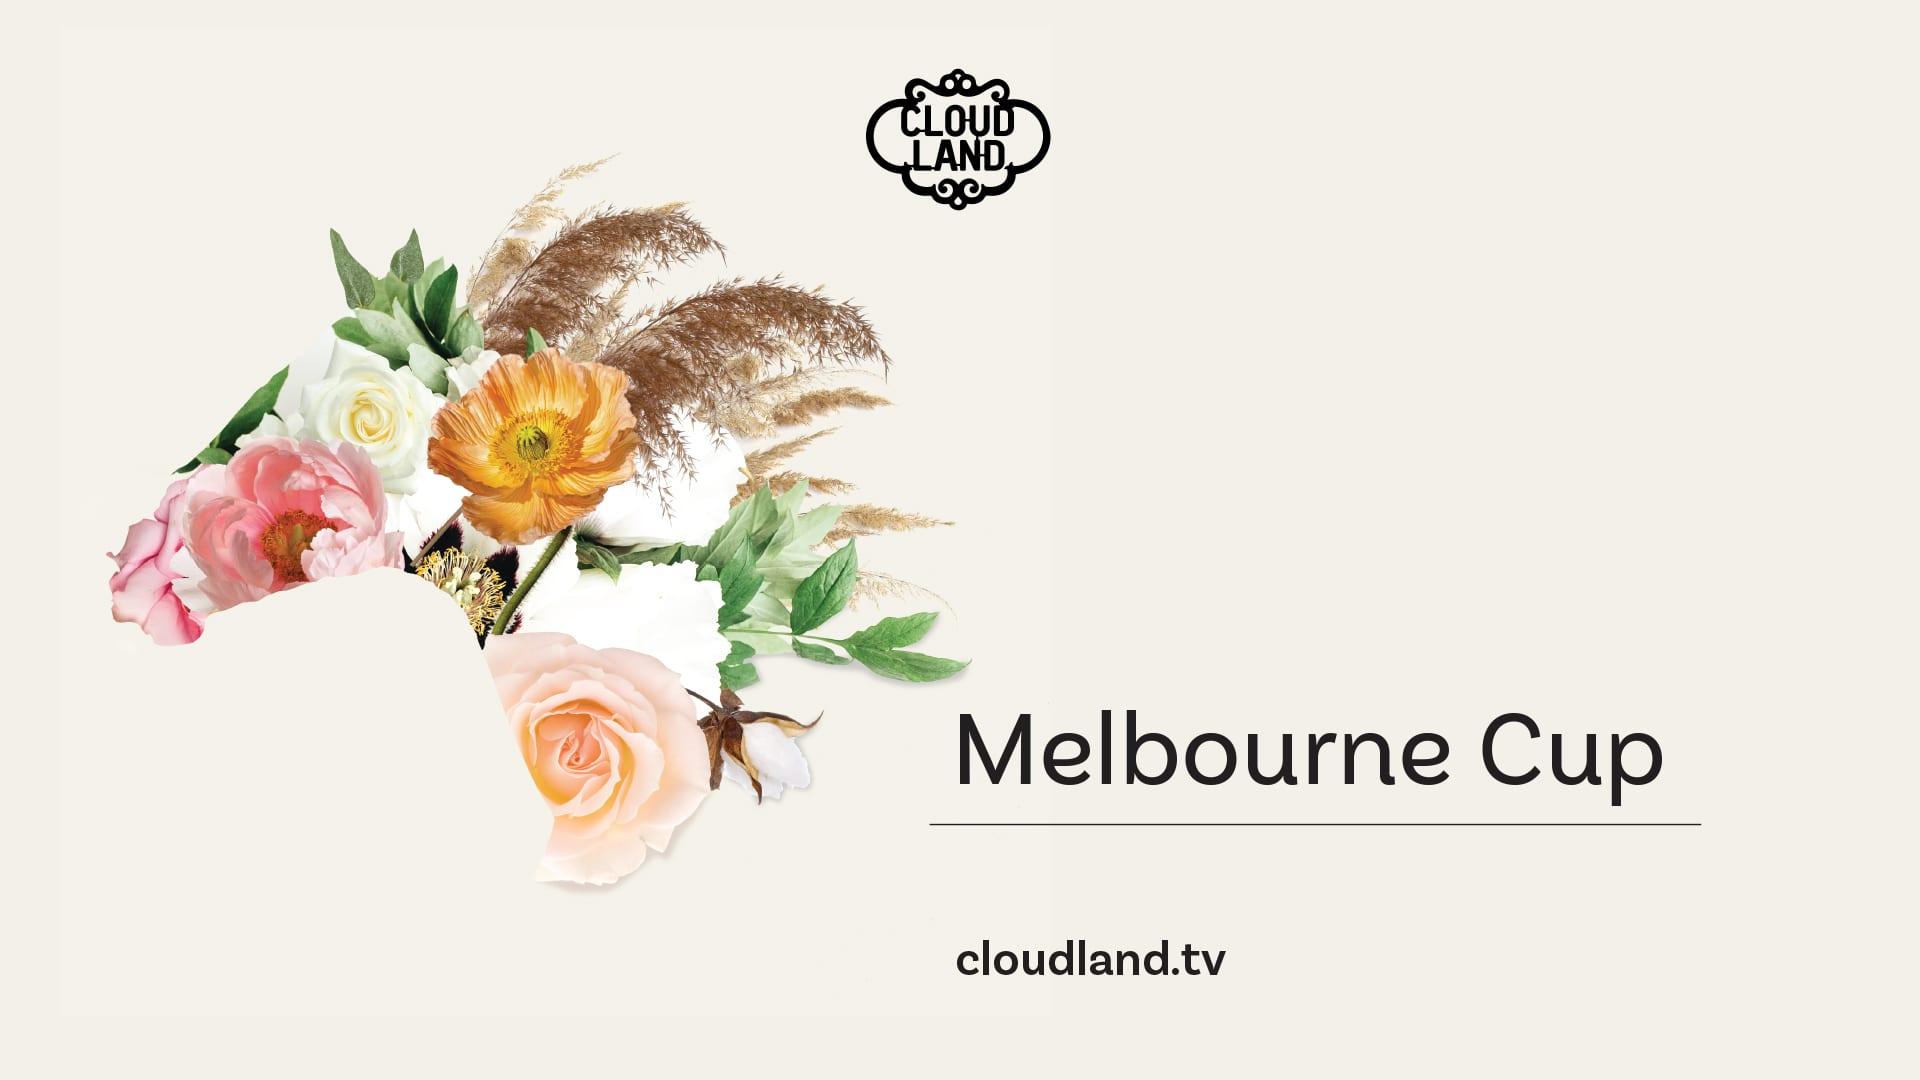 Cloudland Brisbane Melbourne Cup